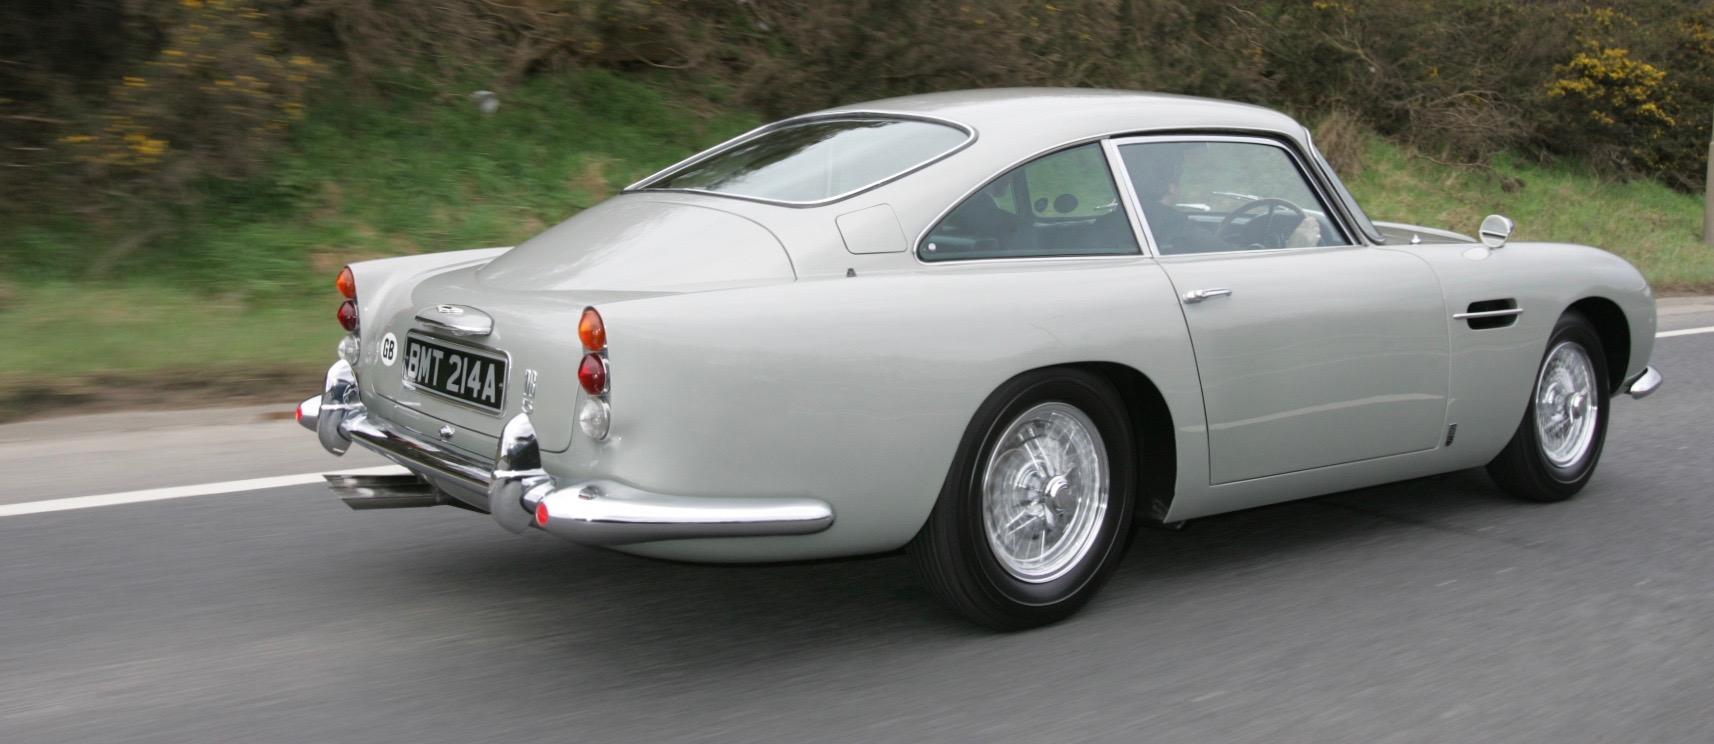 James Bond, James Bond's 'GoldenEye' DB5 going to auction, ClassicCars.com Journal